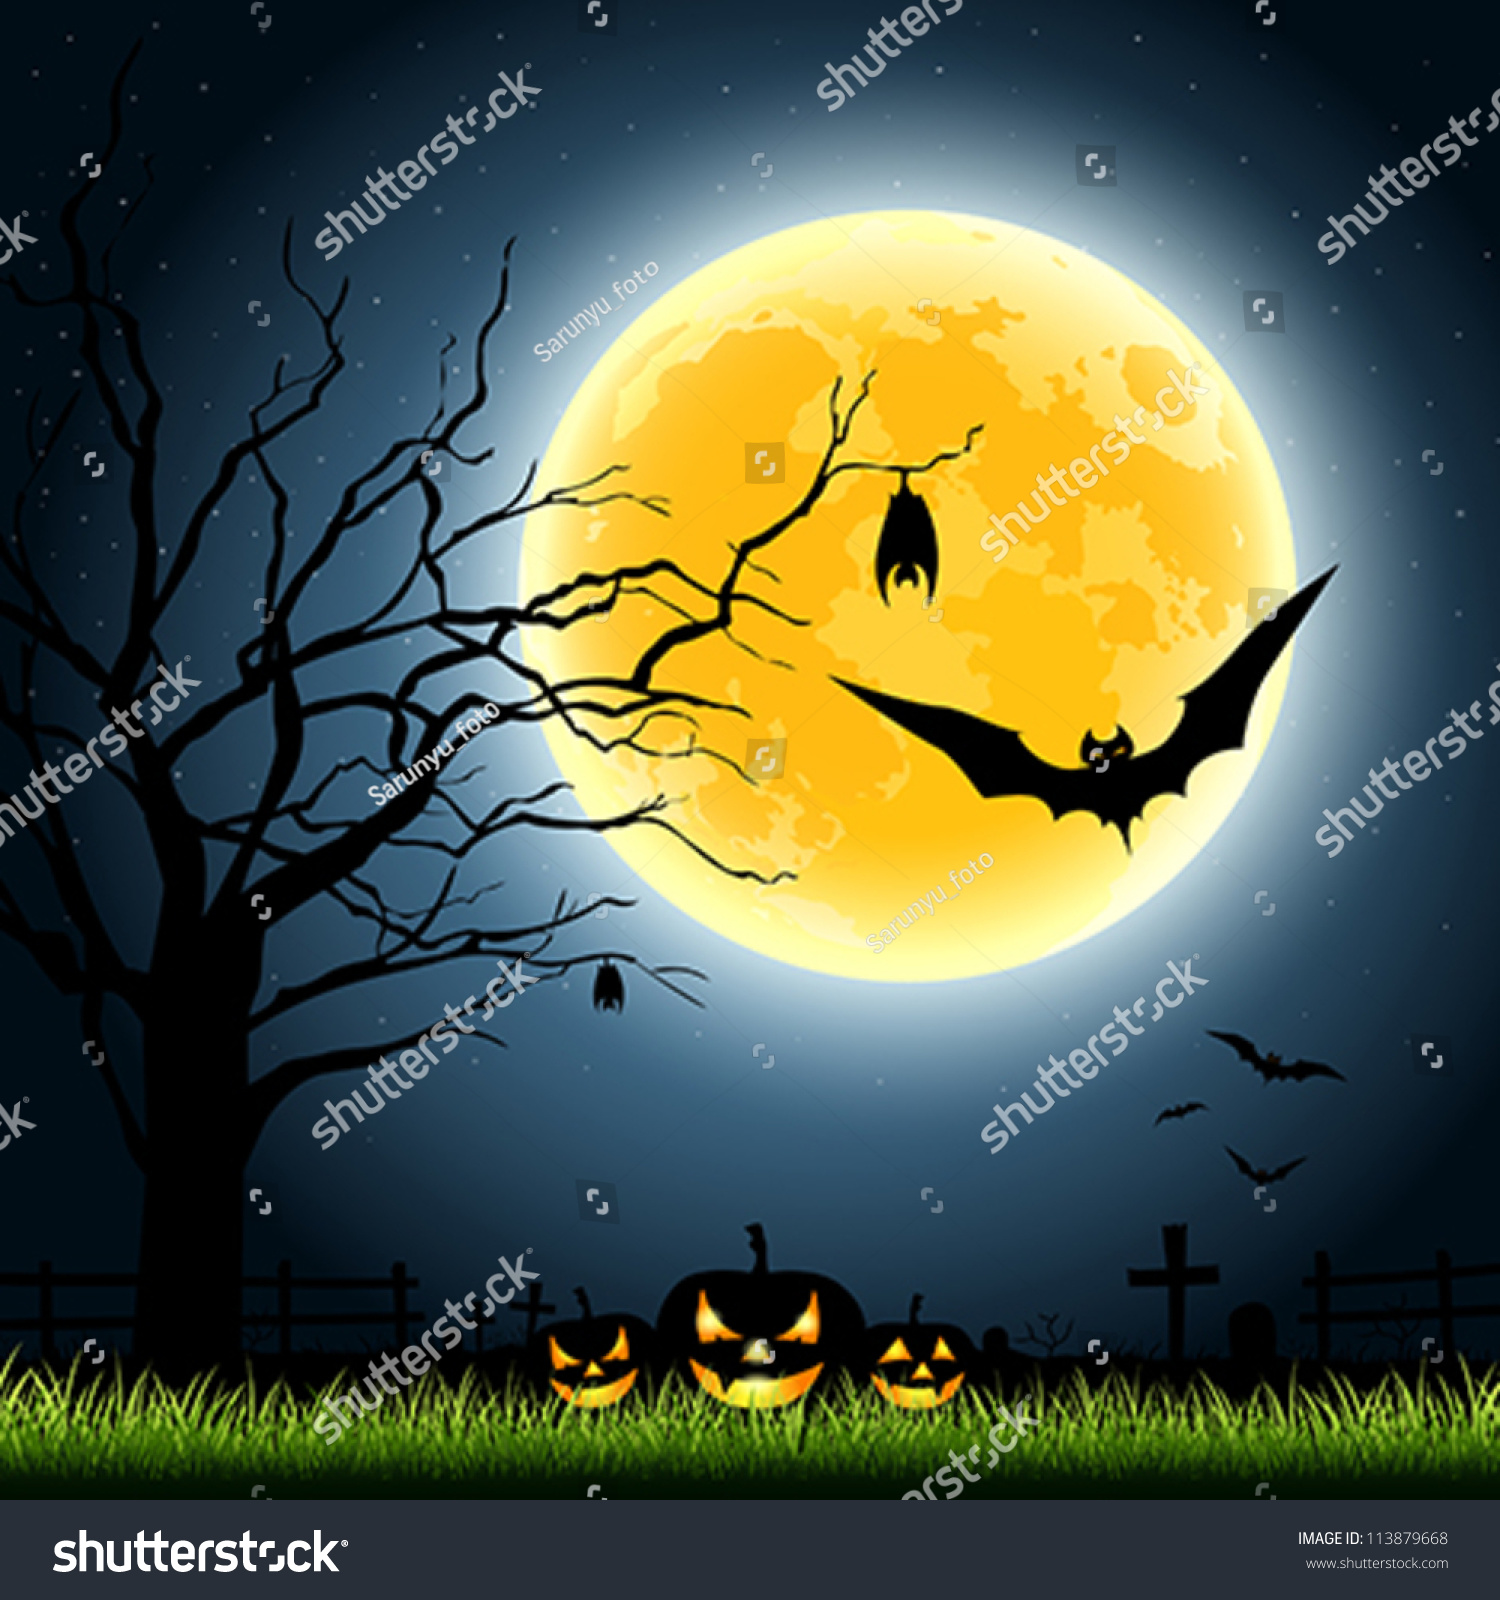 Halloween Full Moon Party Night Background Stock Vector 113879668 ...